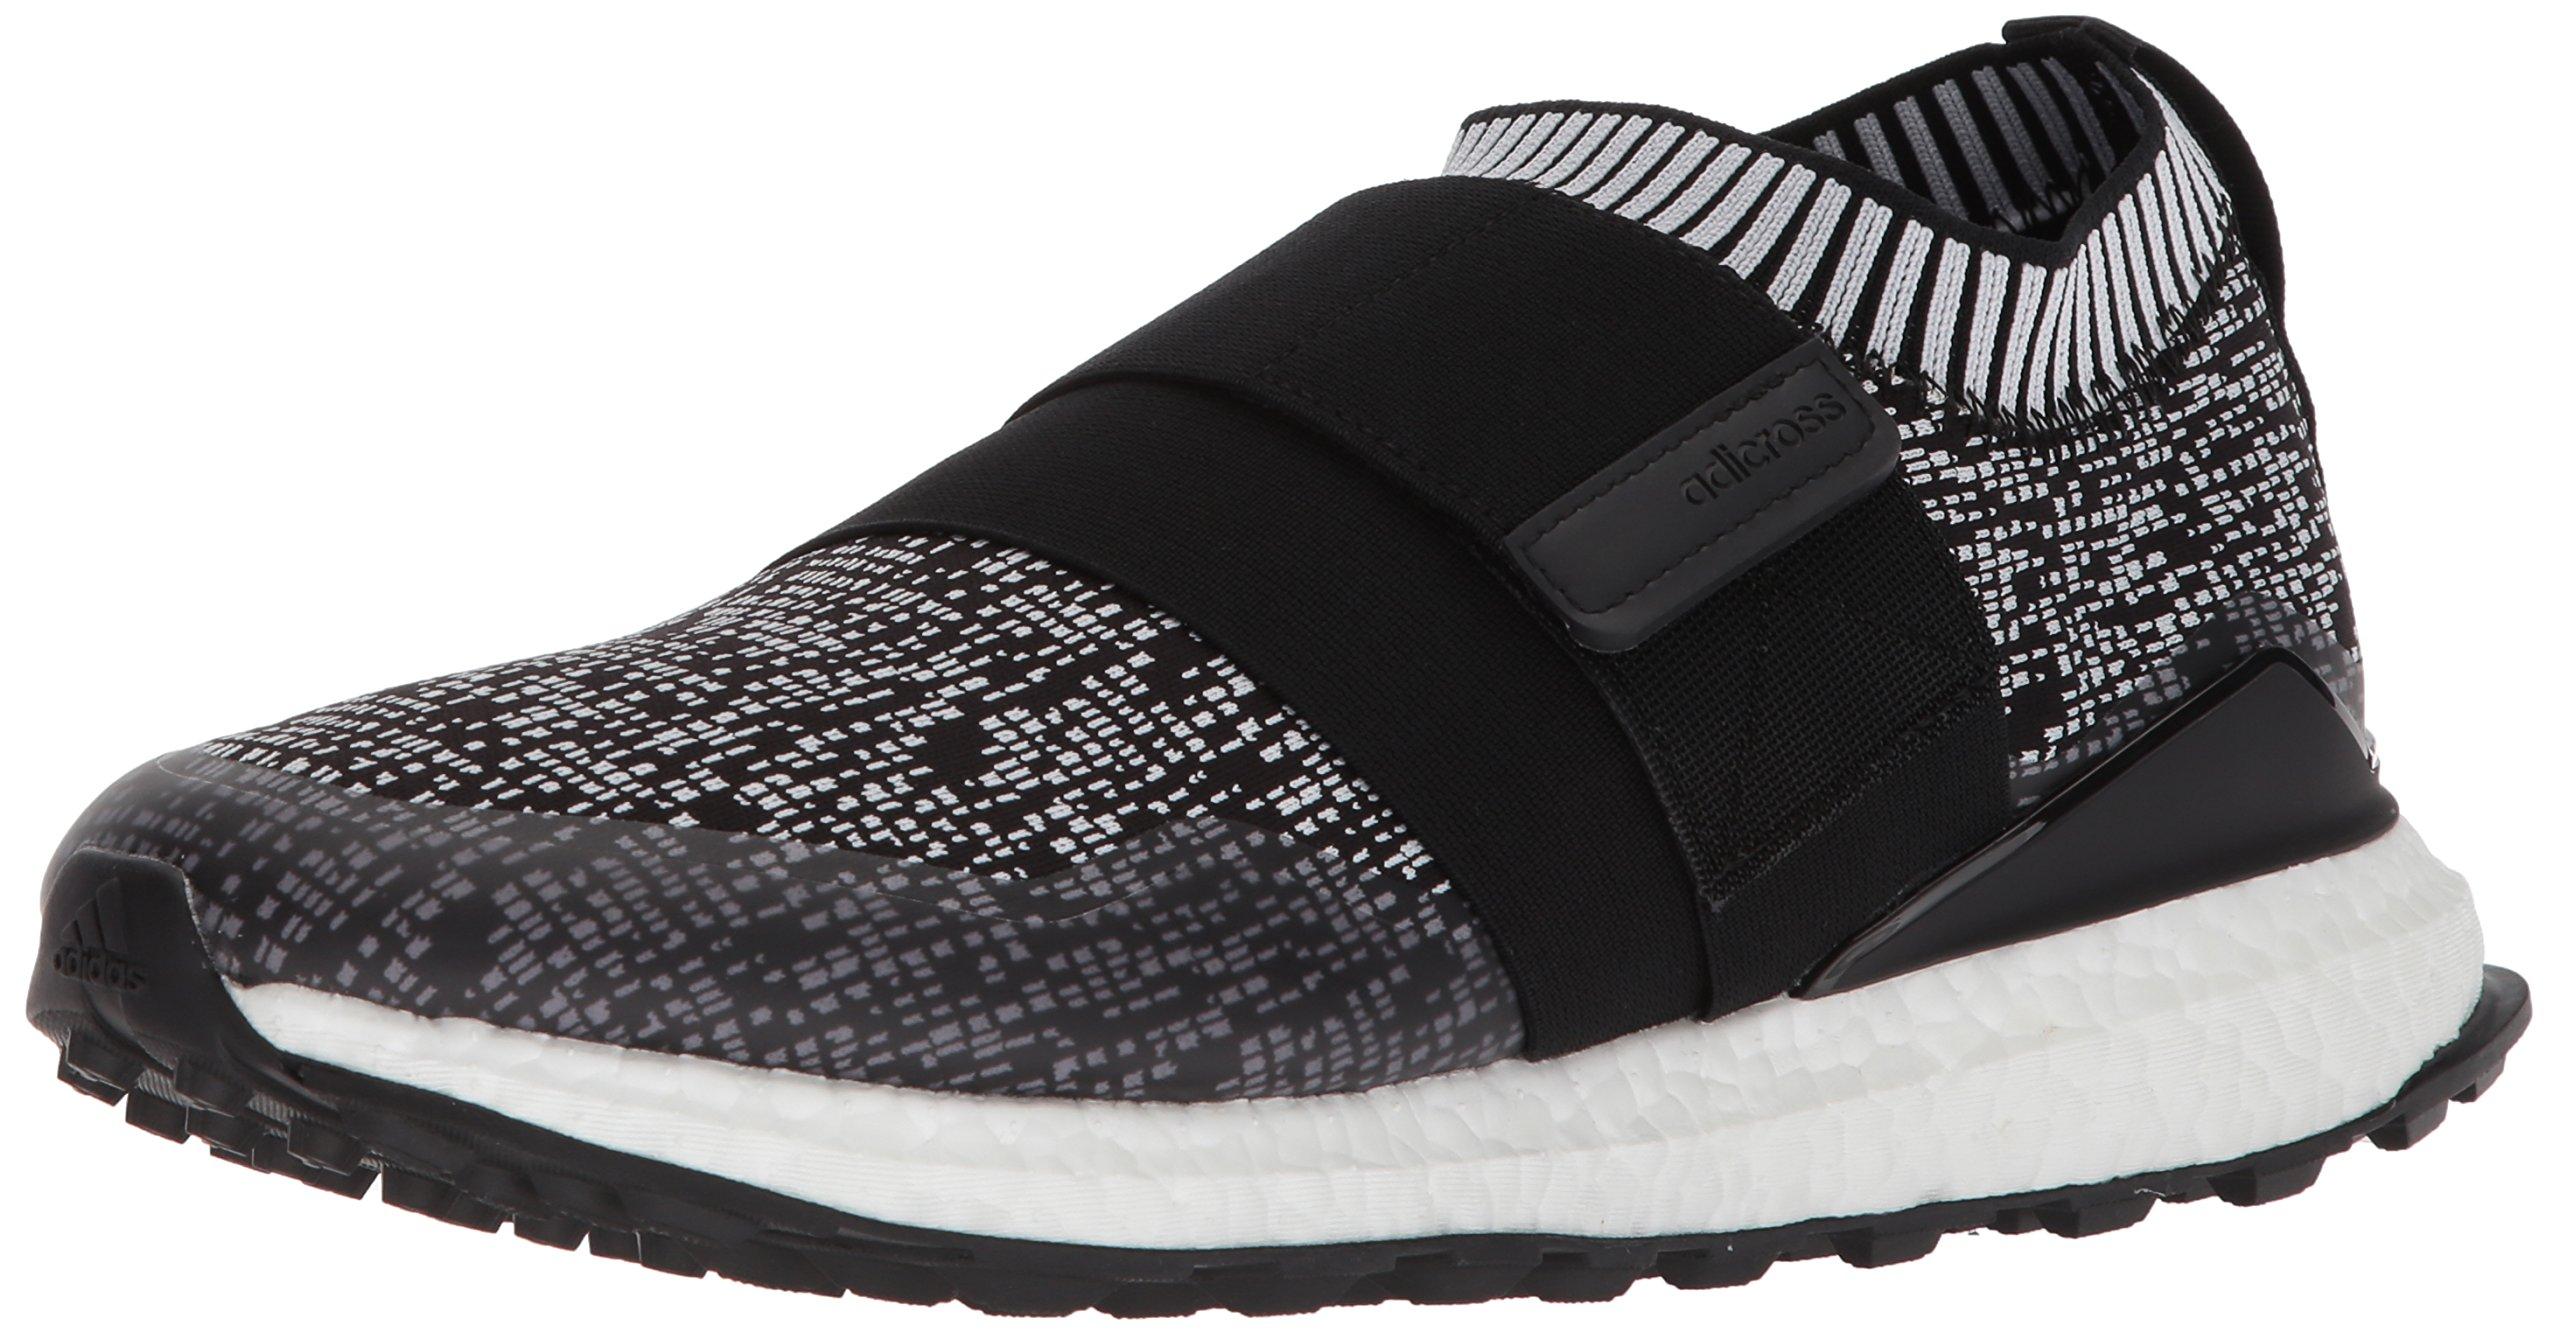 size 40 60c09 fa8ea Galleon - Adidas Mens Crossknit 2.0 Golf Shoe, Core BlackFTWR White, 8.5  Medium US